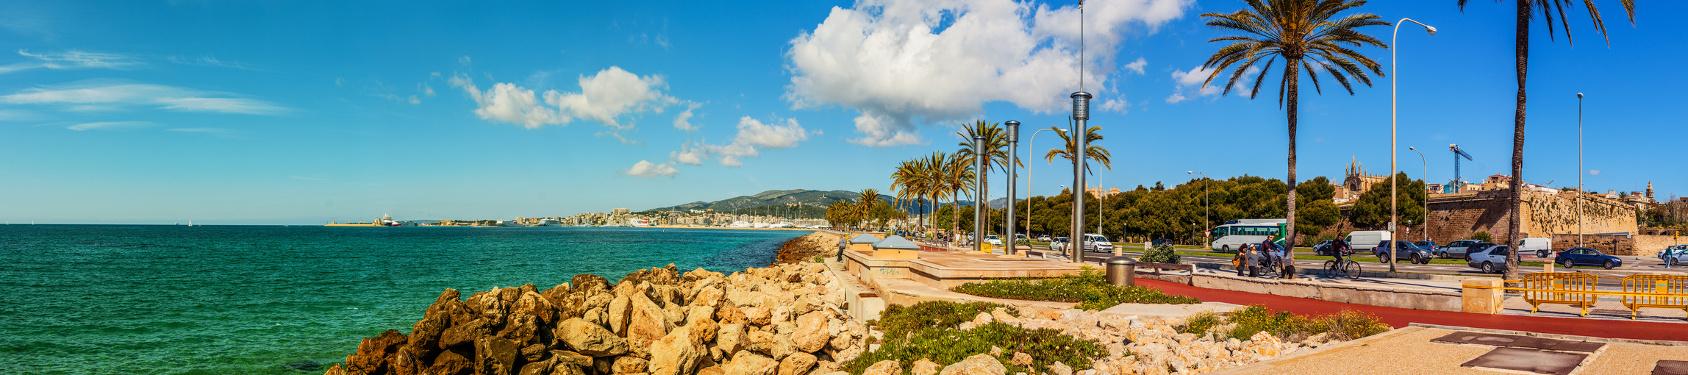 Bild von Mallorca